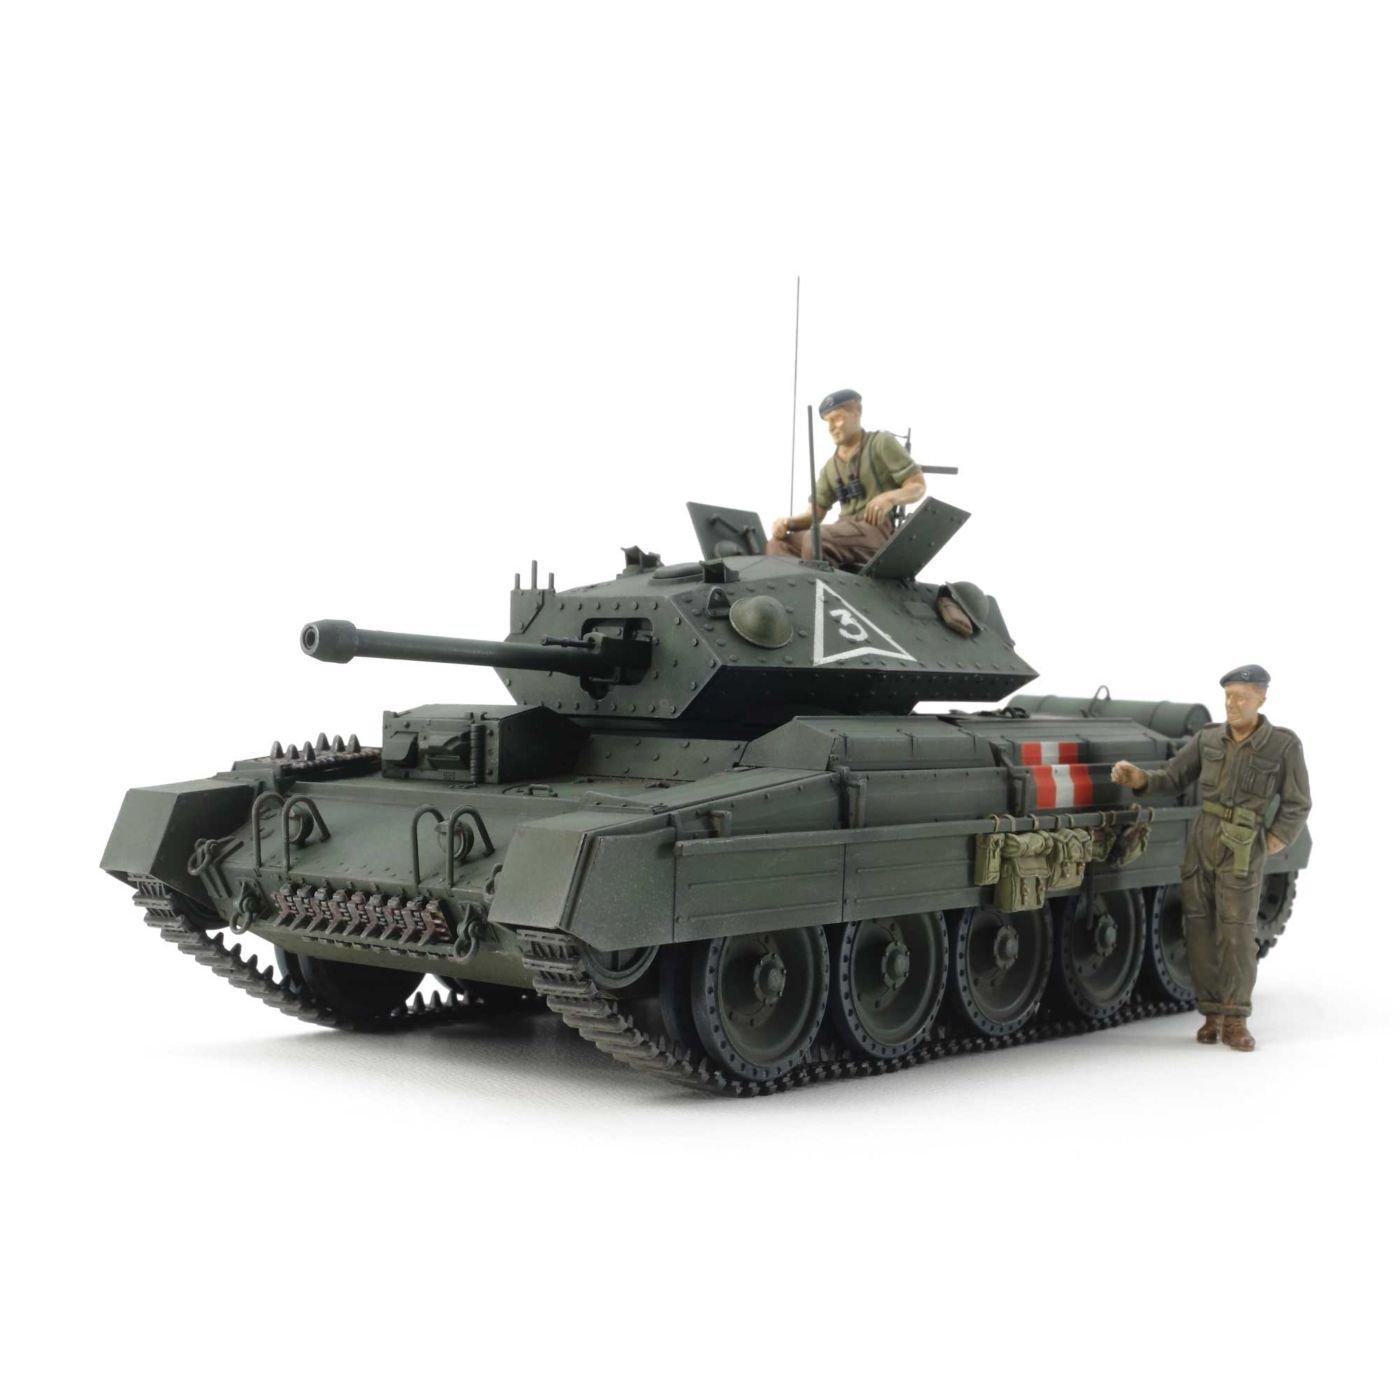 Tamiya America, Inc 1 35 British Mk.VI Crusader Mk.III Cruiser Tank, TAM37025